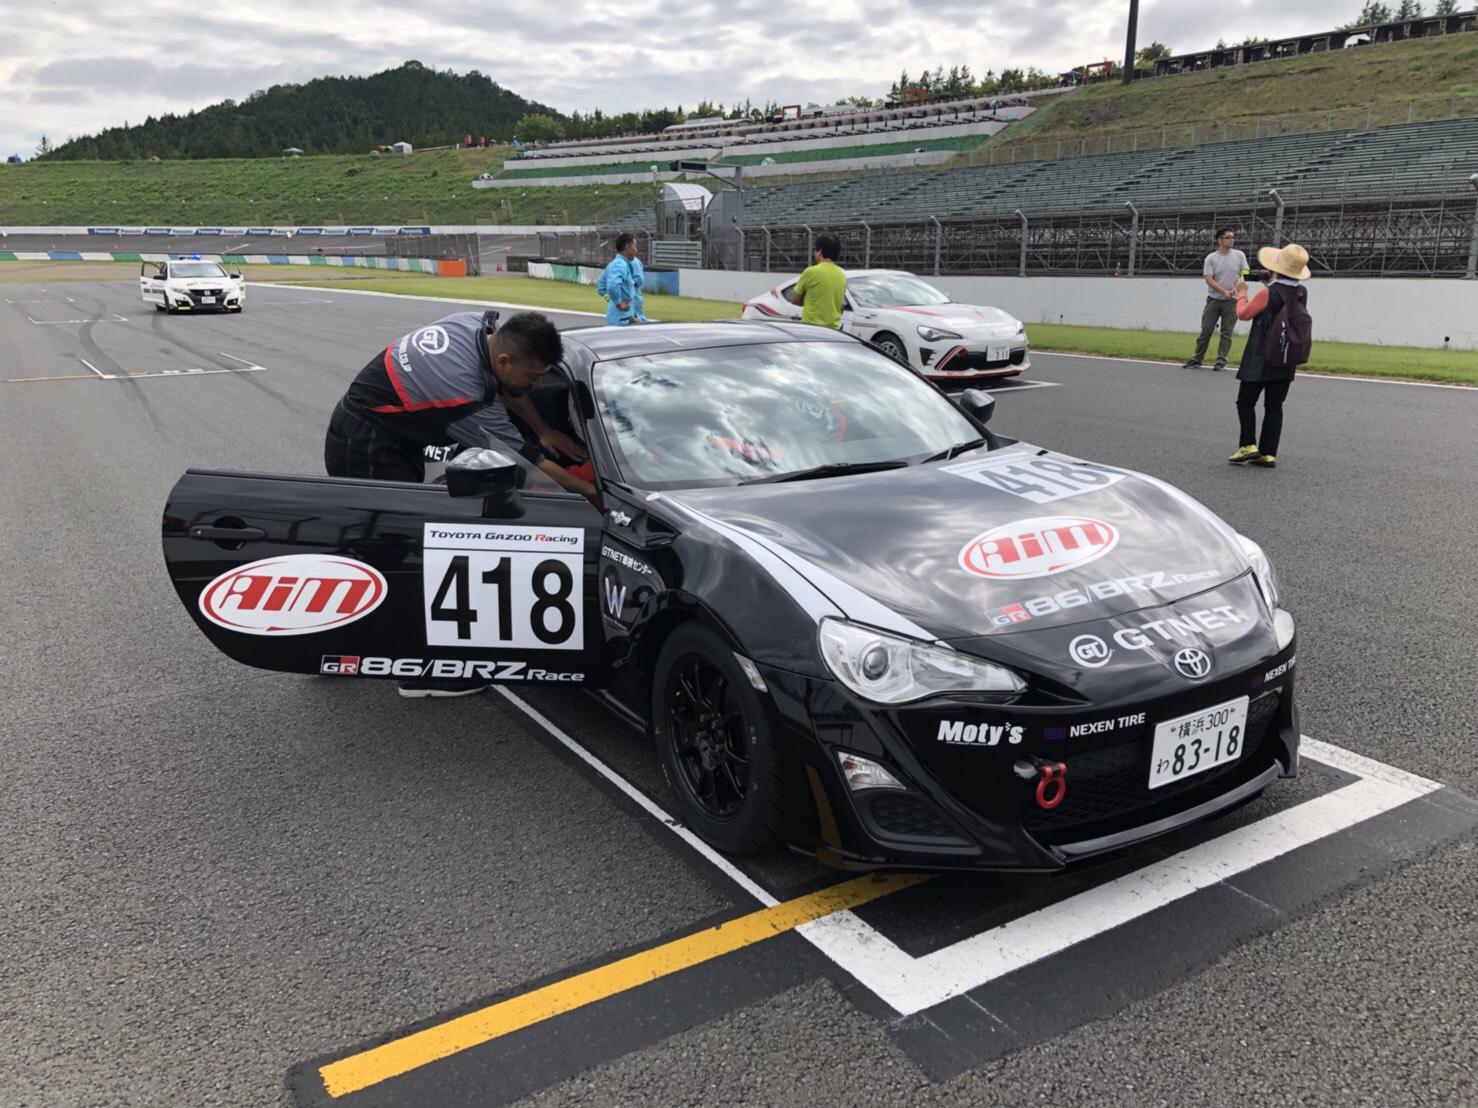 86/BRZ Race 2018 もてぎ ネクセン 418 GTNET